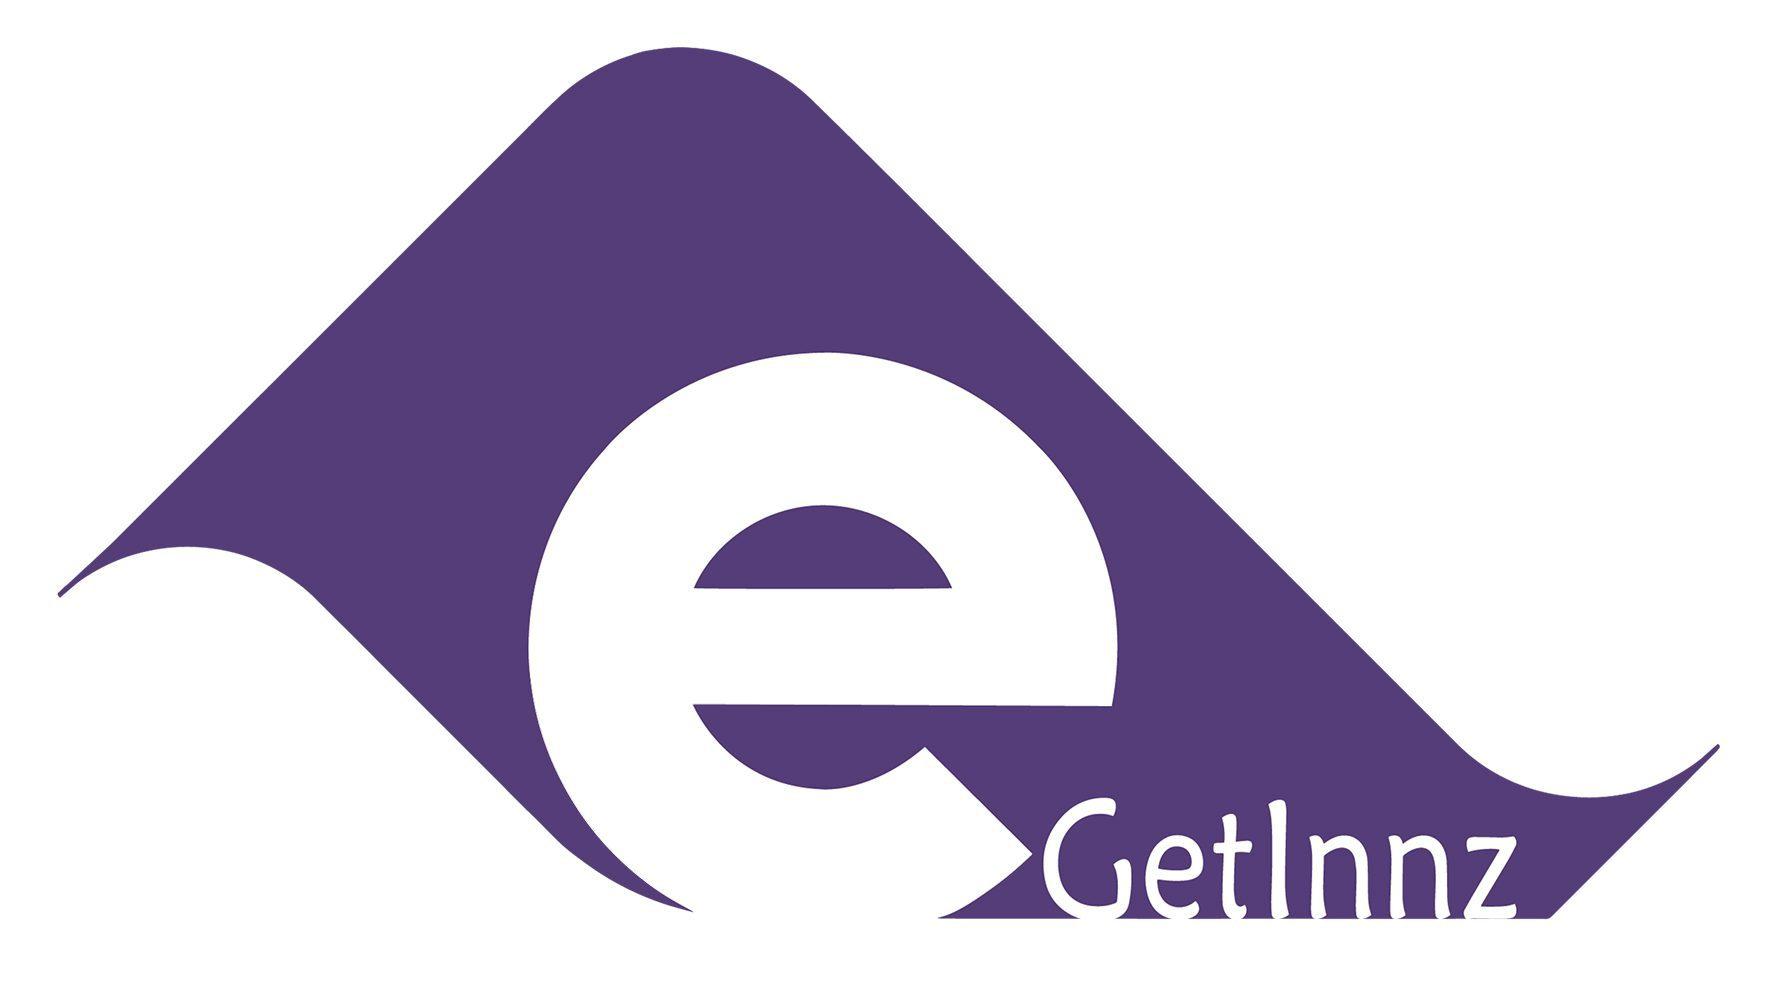 cropped-cropped-NEW-eGetinnz-Logo.jpg